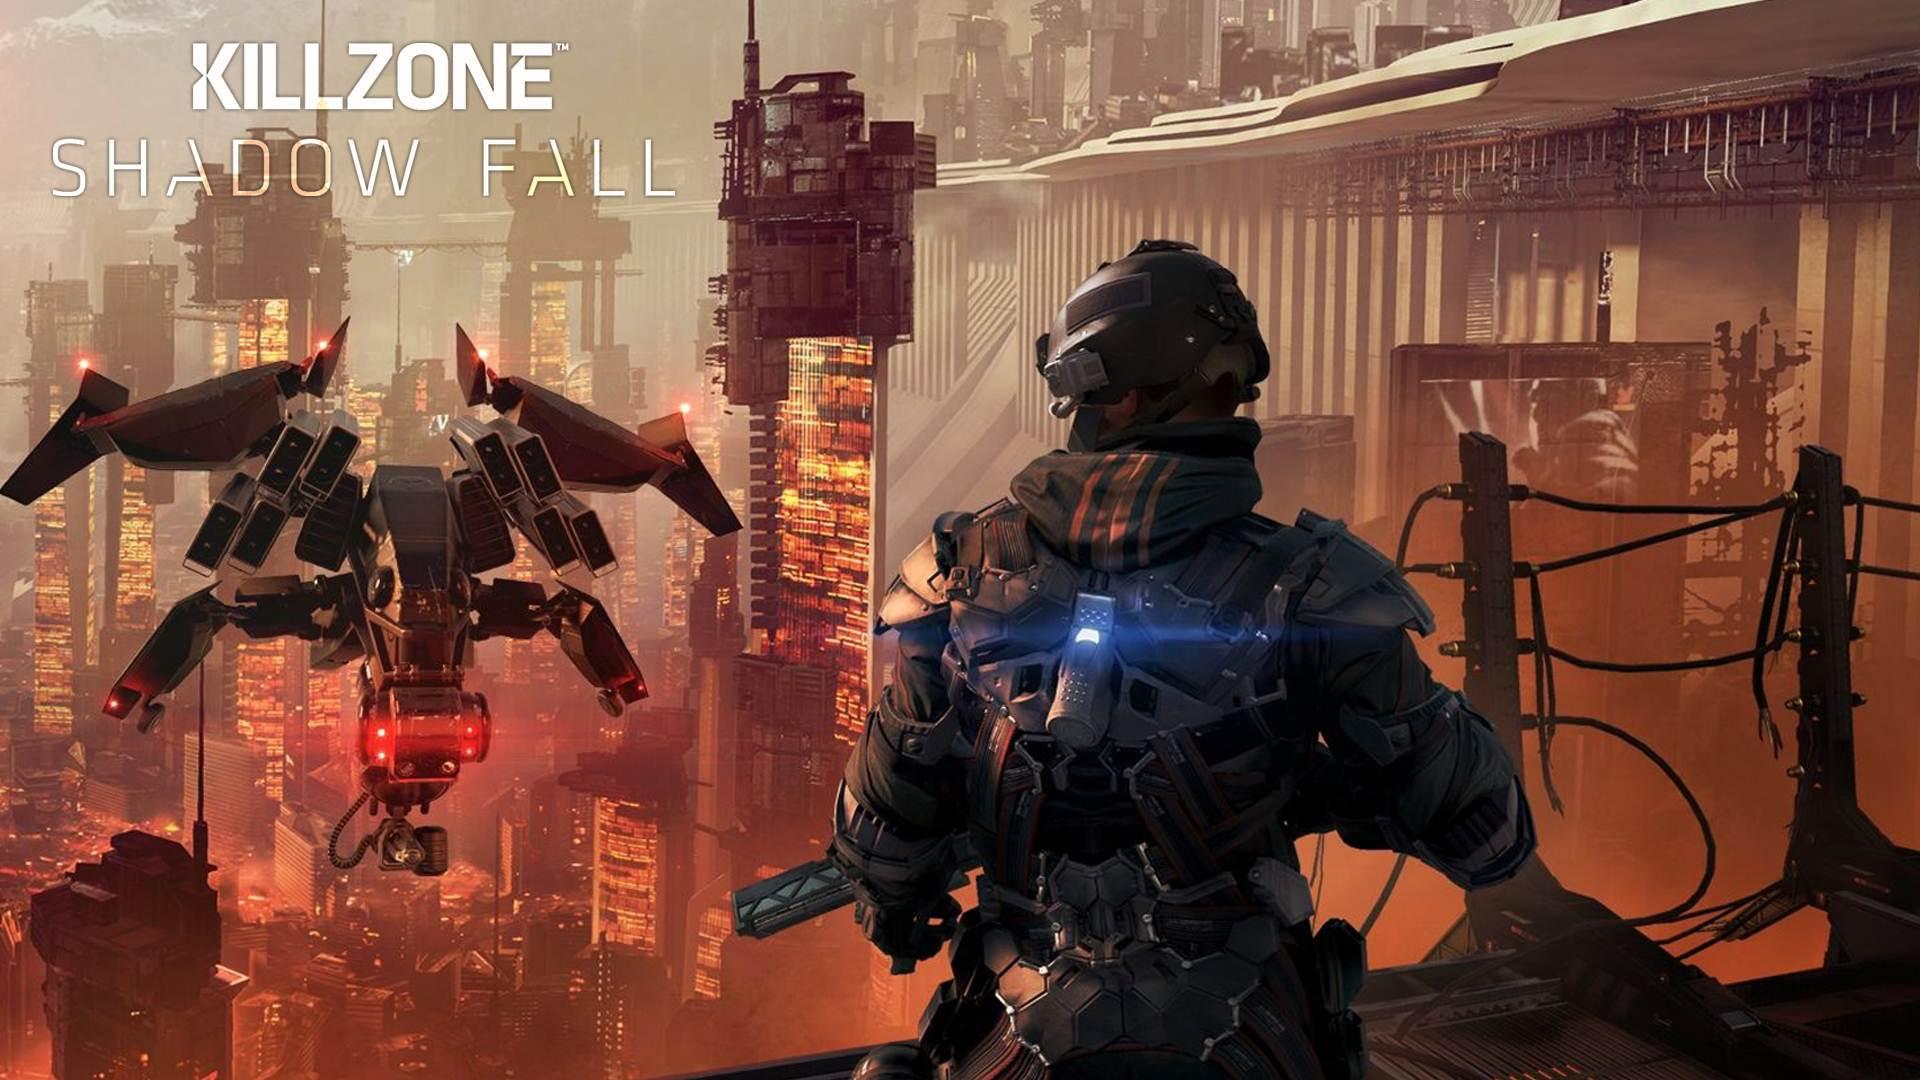 killzone PS4 Animation Career Paths: Alumnus Niek Neervens on Game Animation and Horizon Zero Dawn